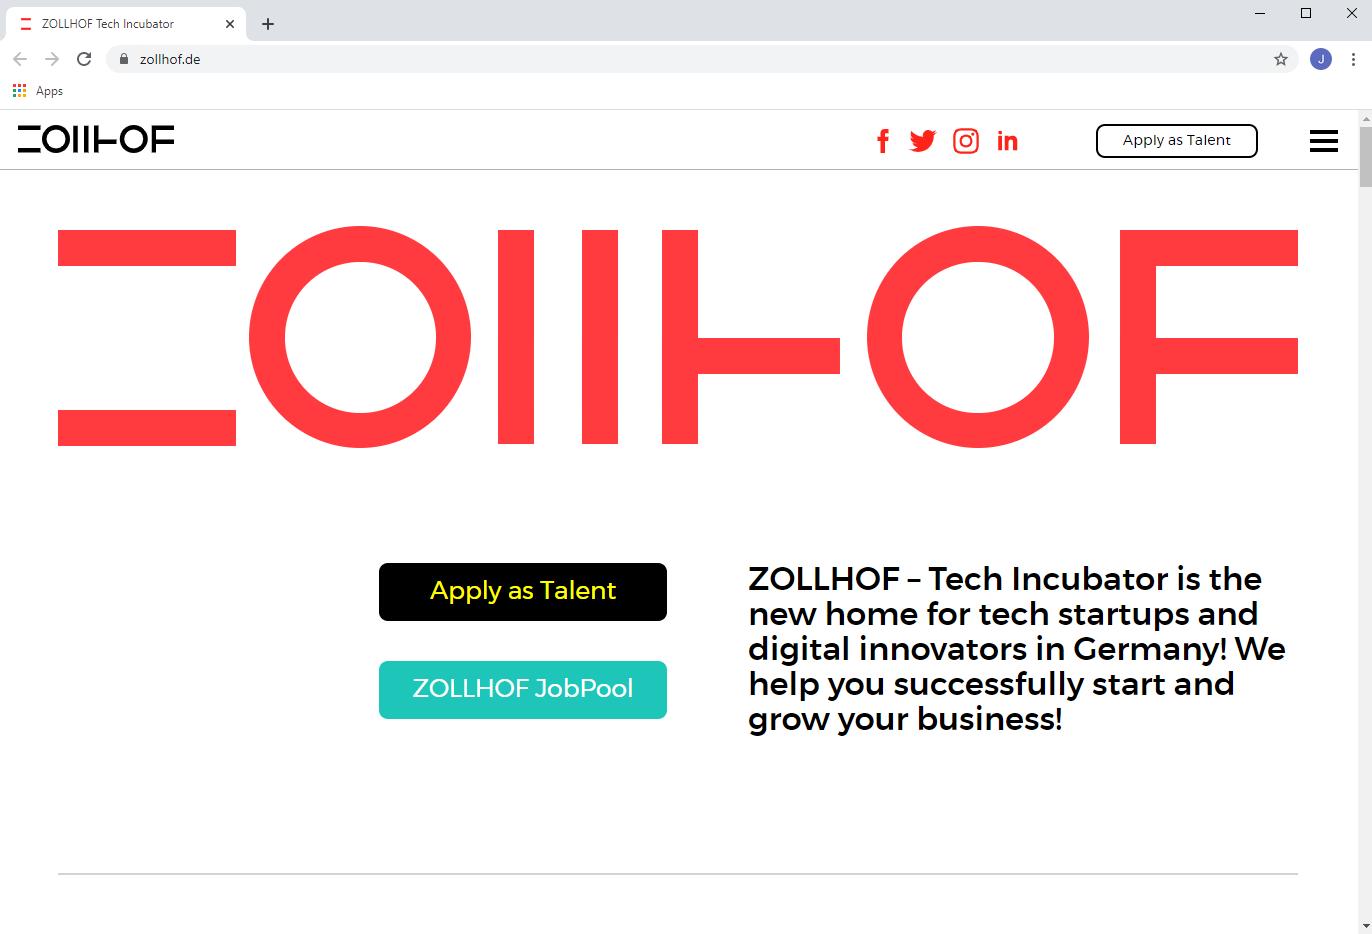 Zollhof Innovations zentrum Tech Inkubator